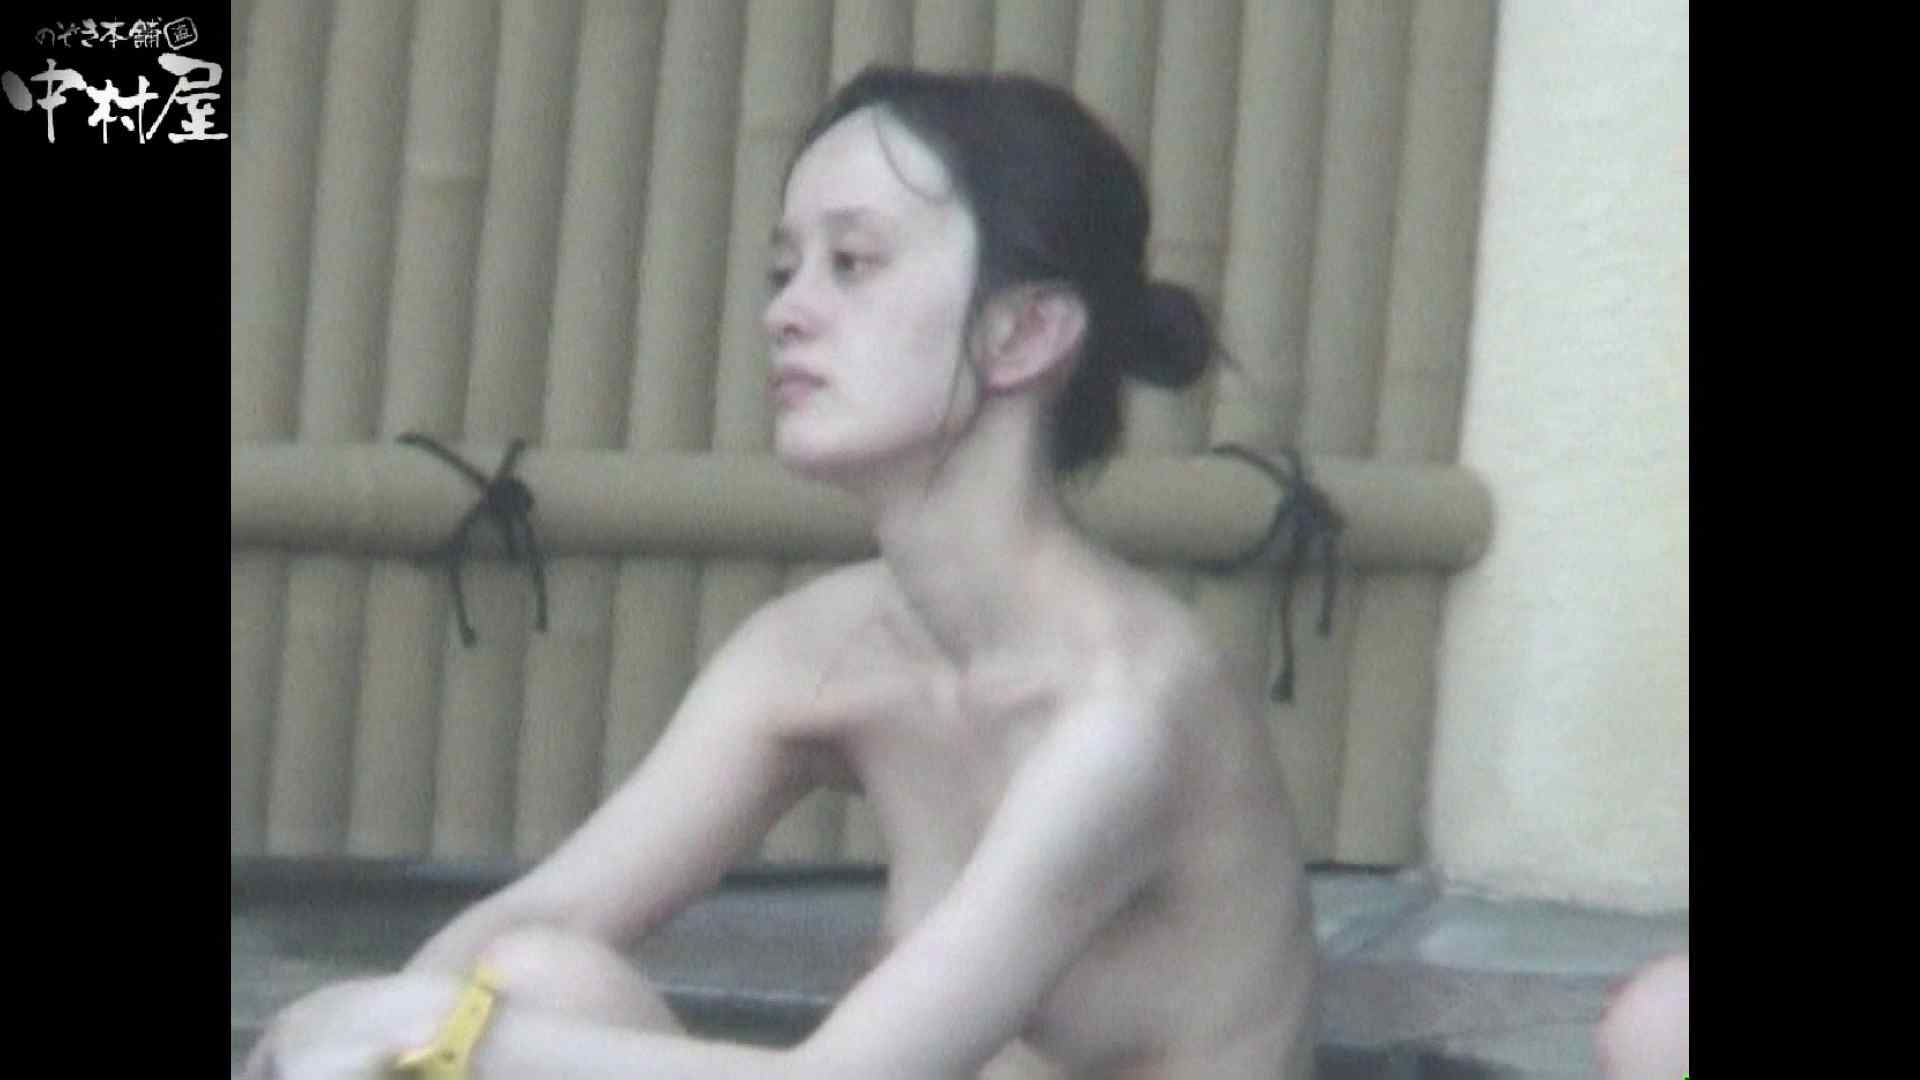 Aquaな露天風呂Vol.973 盗撮師作品  95pic 63